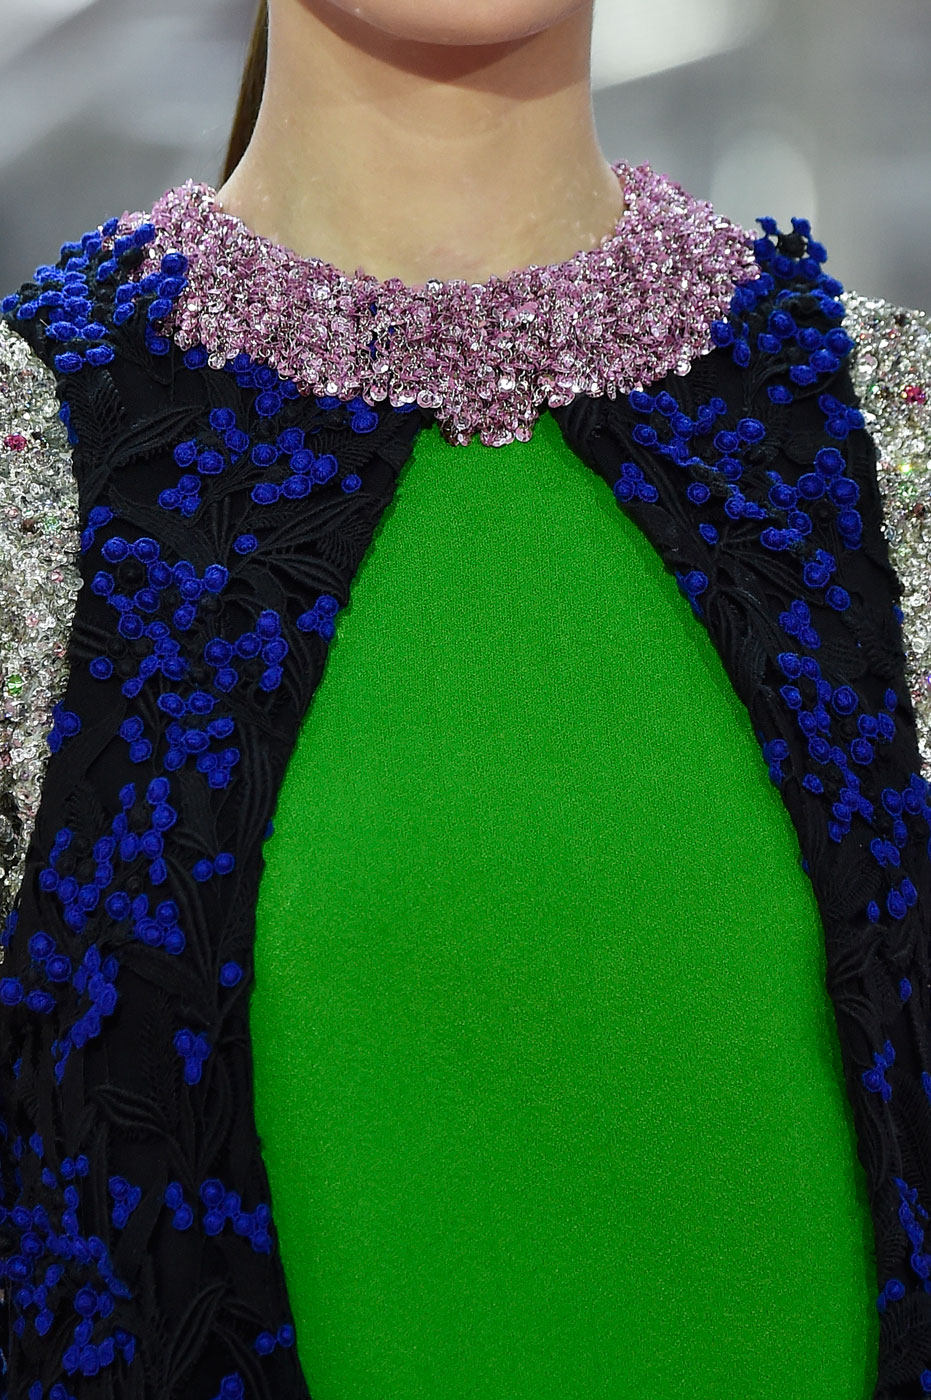 Christian-Dior-fashion-runway-show-close-ups-haute-couture-paris-spring-summer-2015-the-impression-040